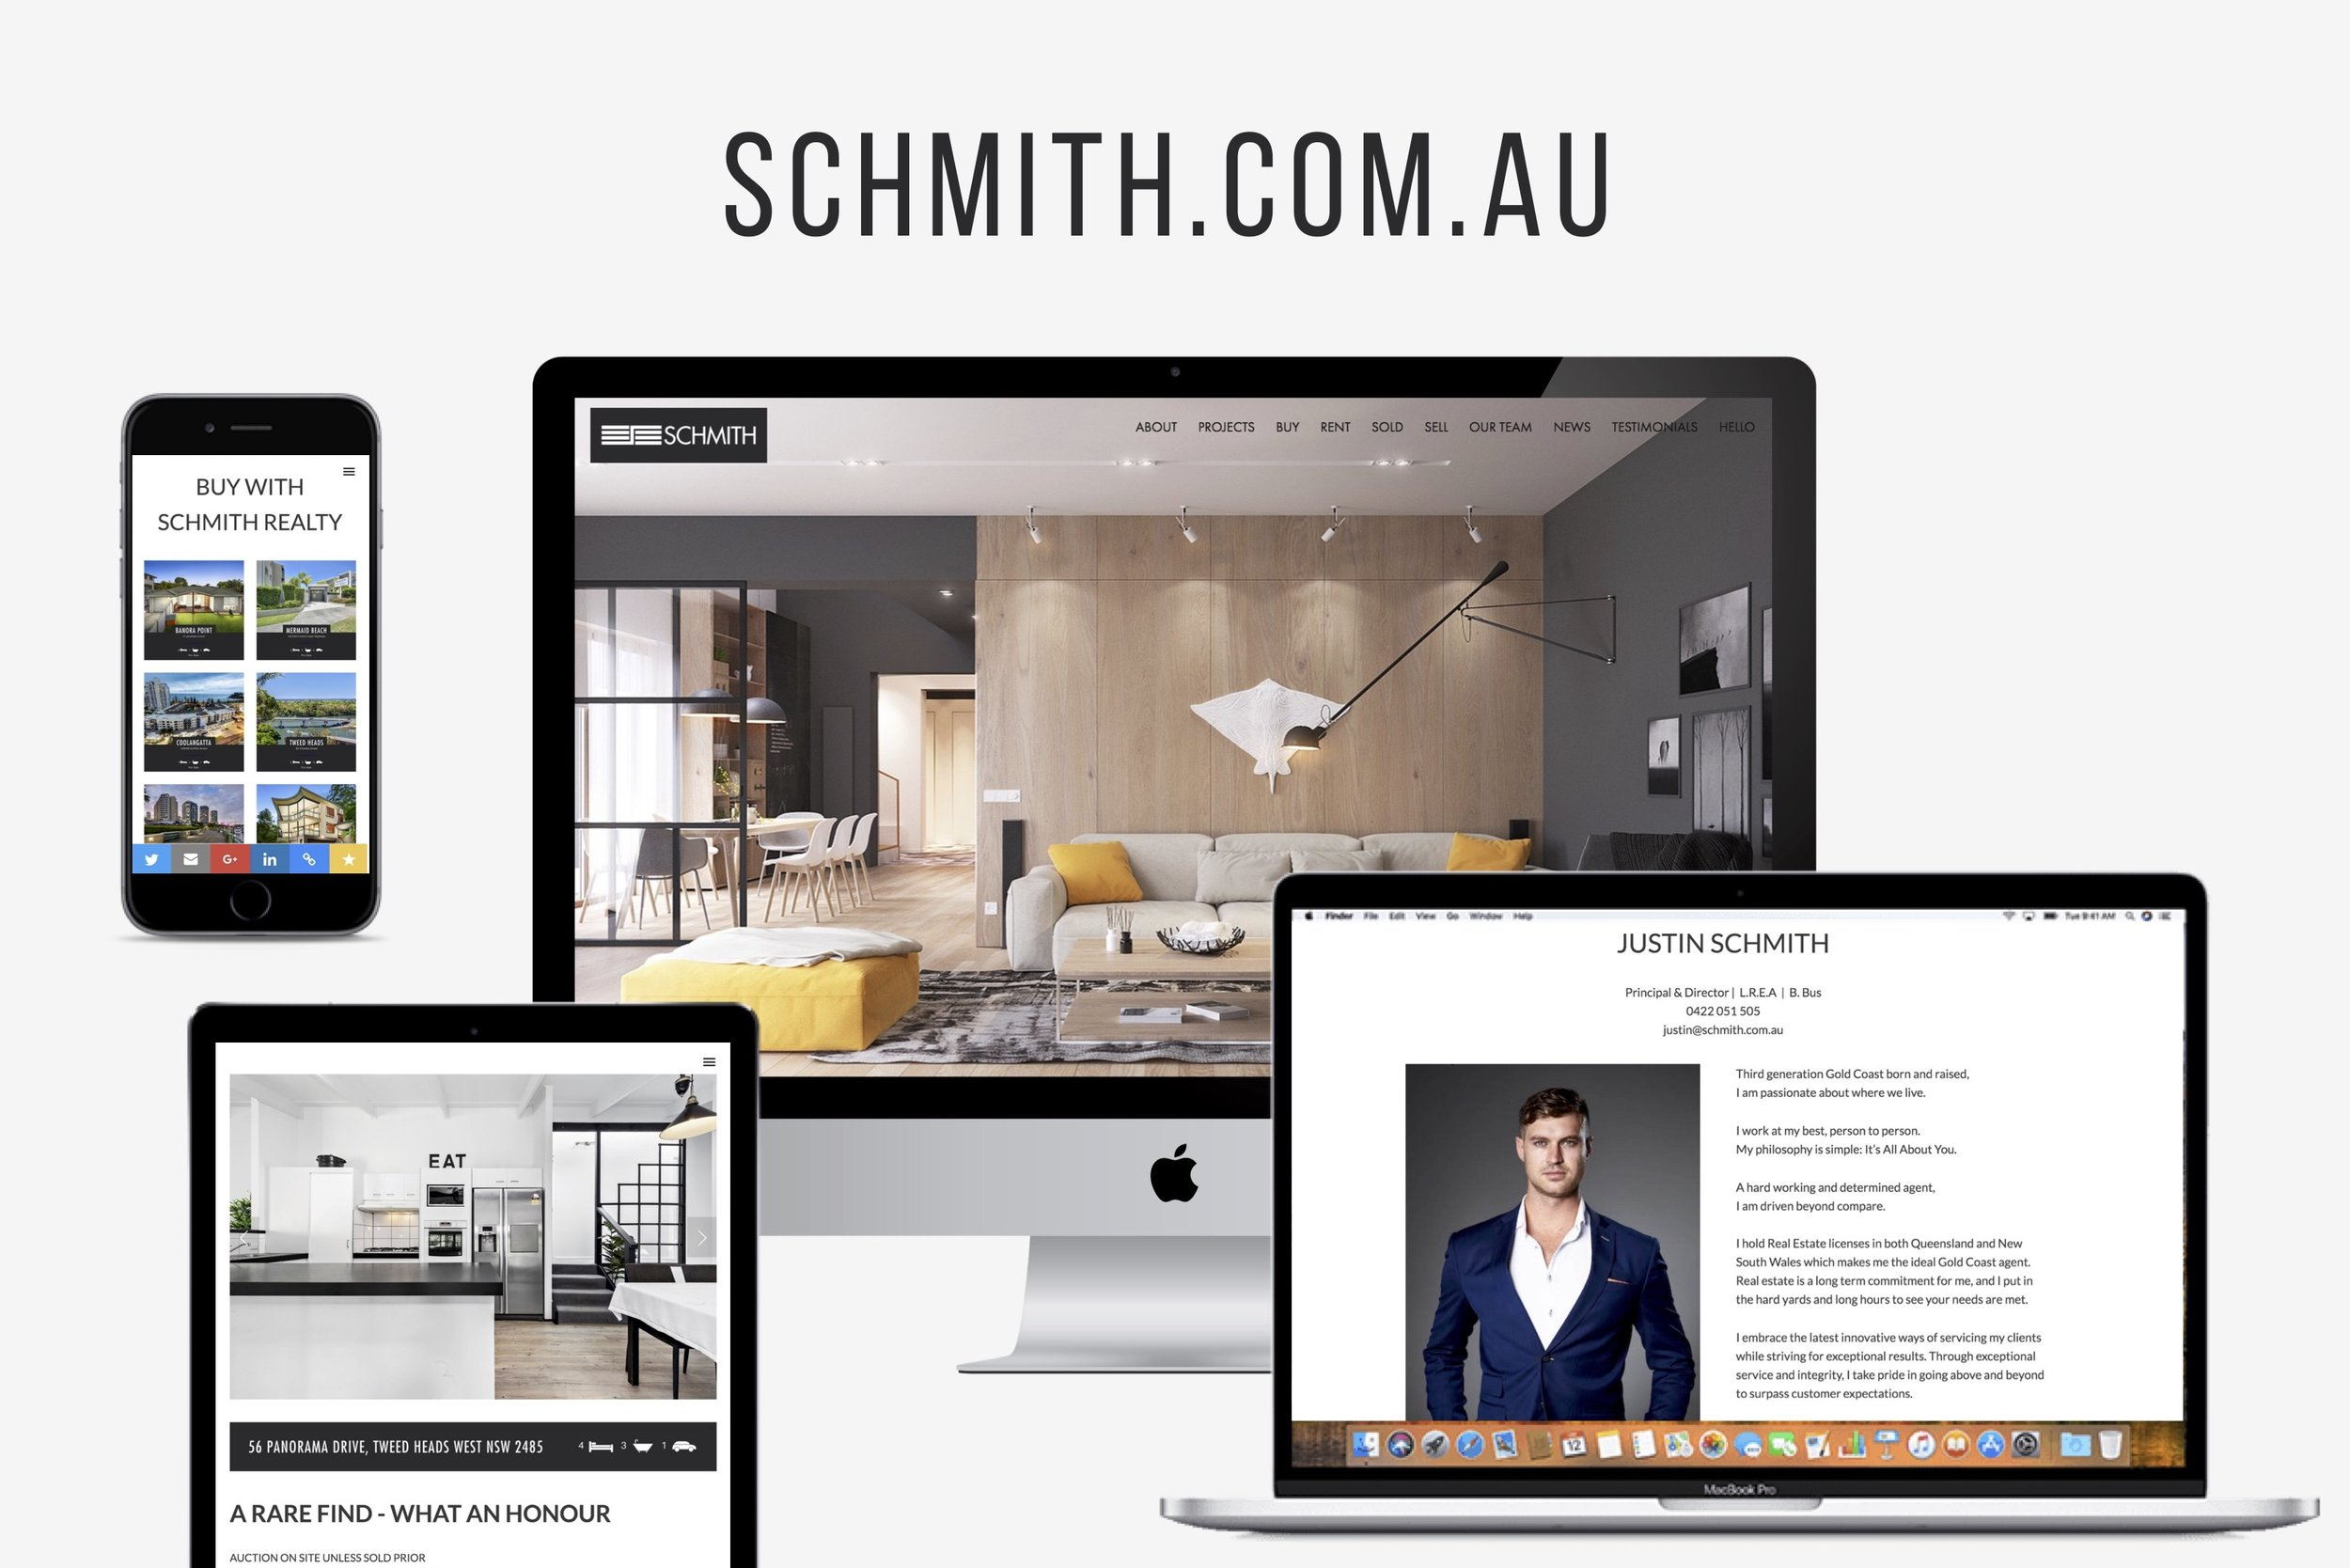 Schmith copy.jpg